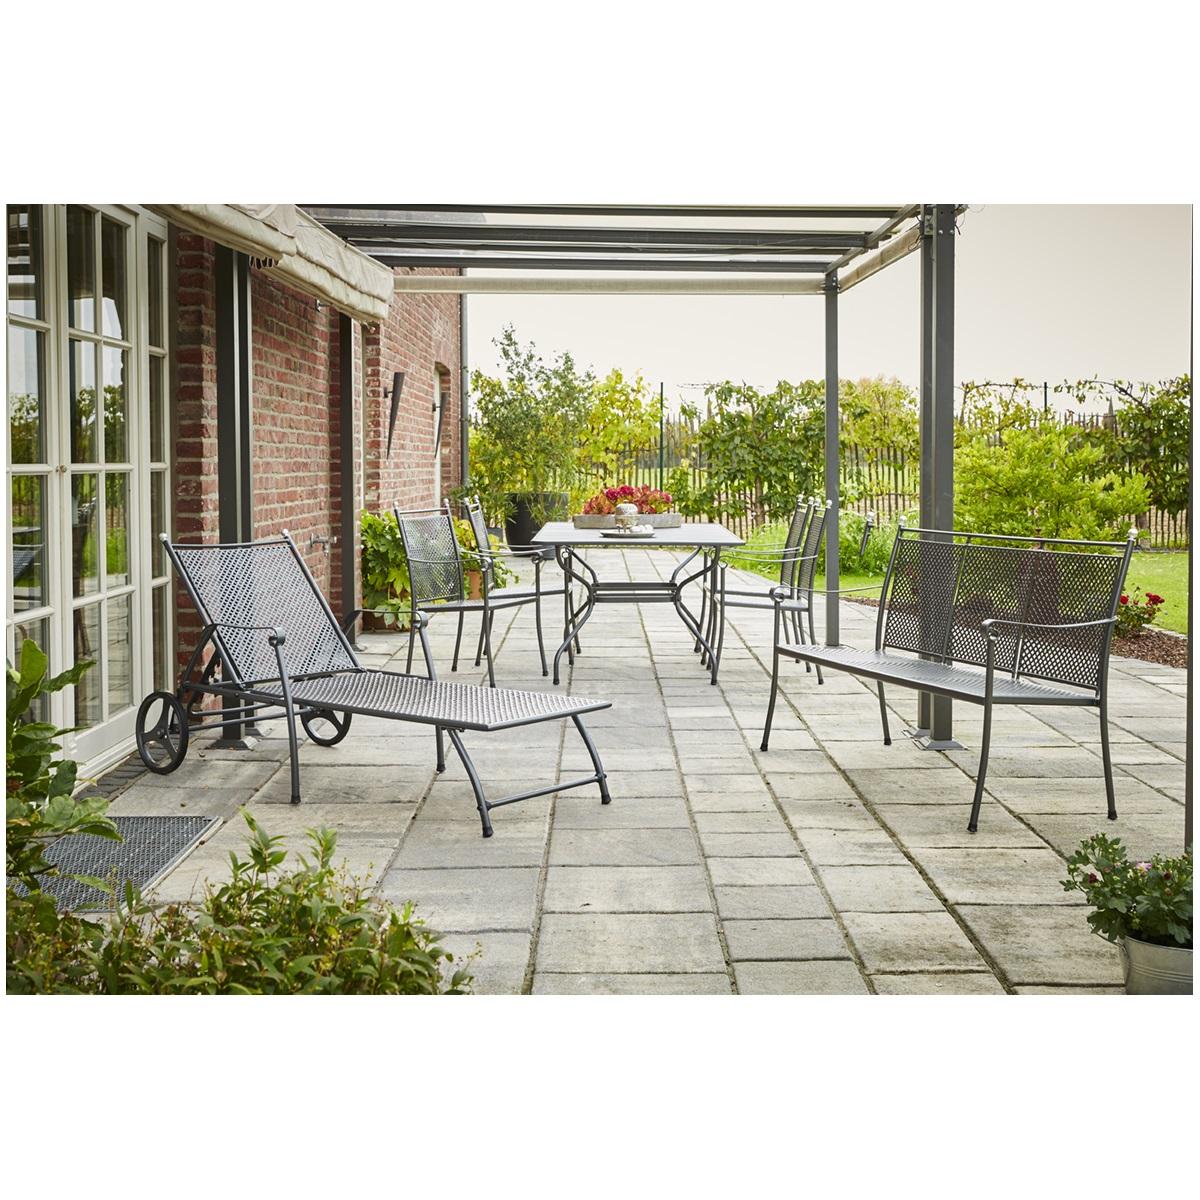 Royal Garden Excelsior Set, sestava nábytku (1x stůl Royal Verso + 4x stoh. židle Excelsior + 1x lehátko Excelsior)